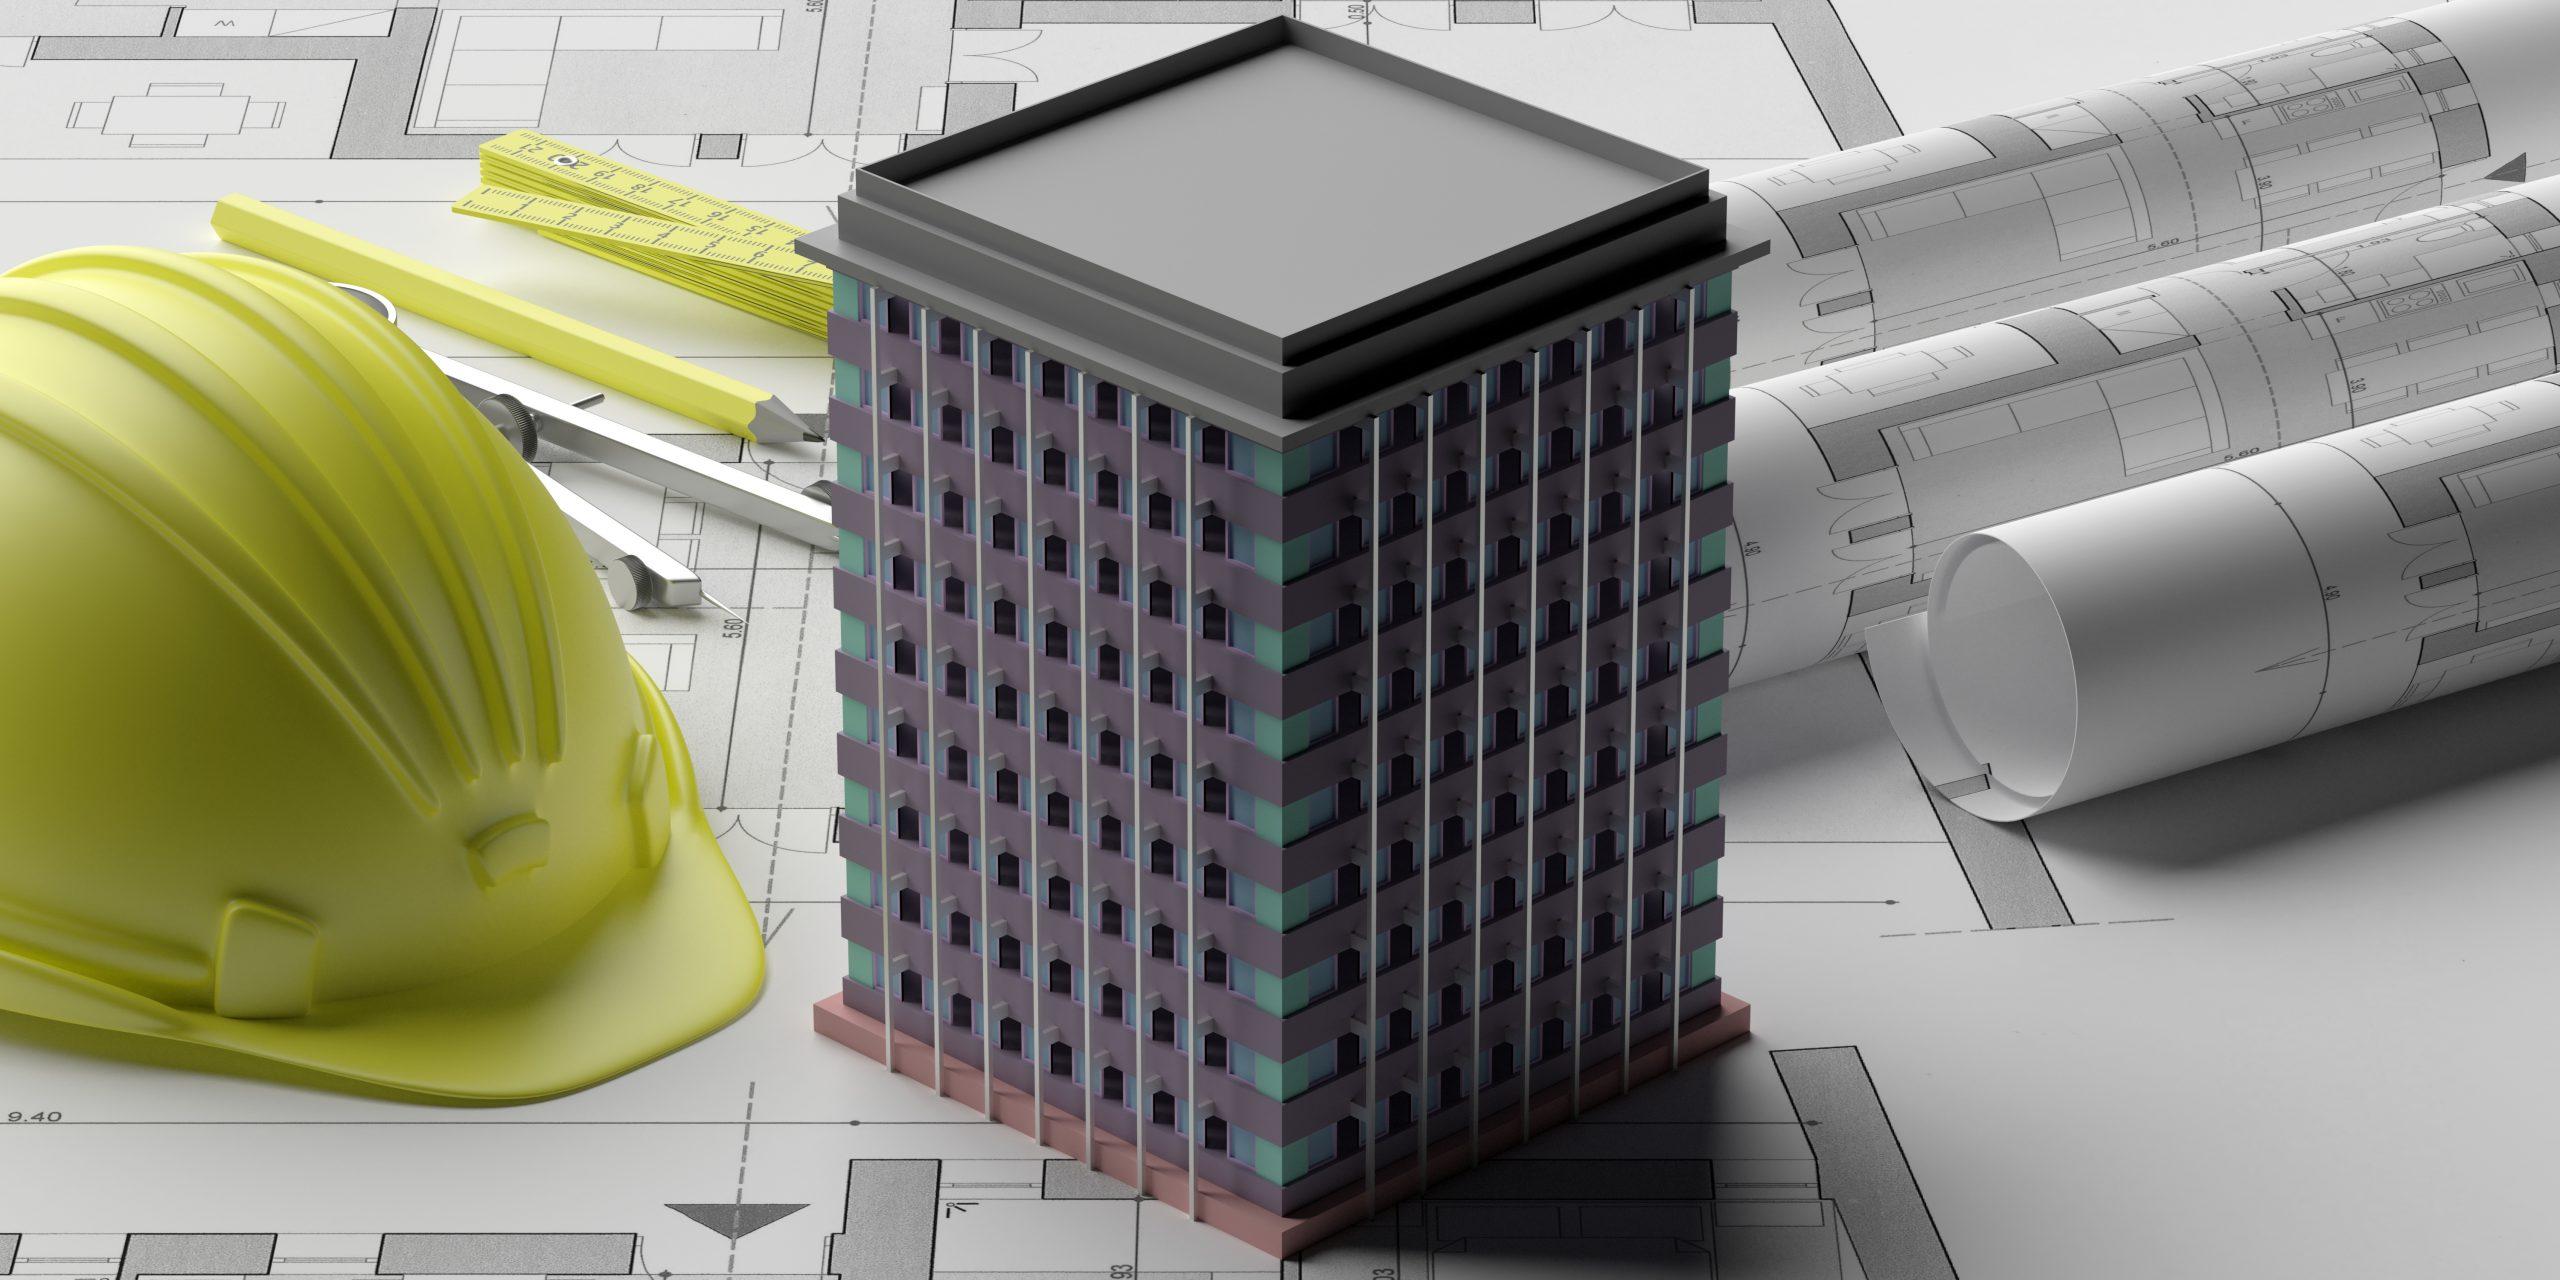 mengatasi getaran struktur bangunan mockup arsitektur bangunan